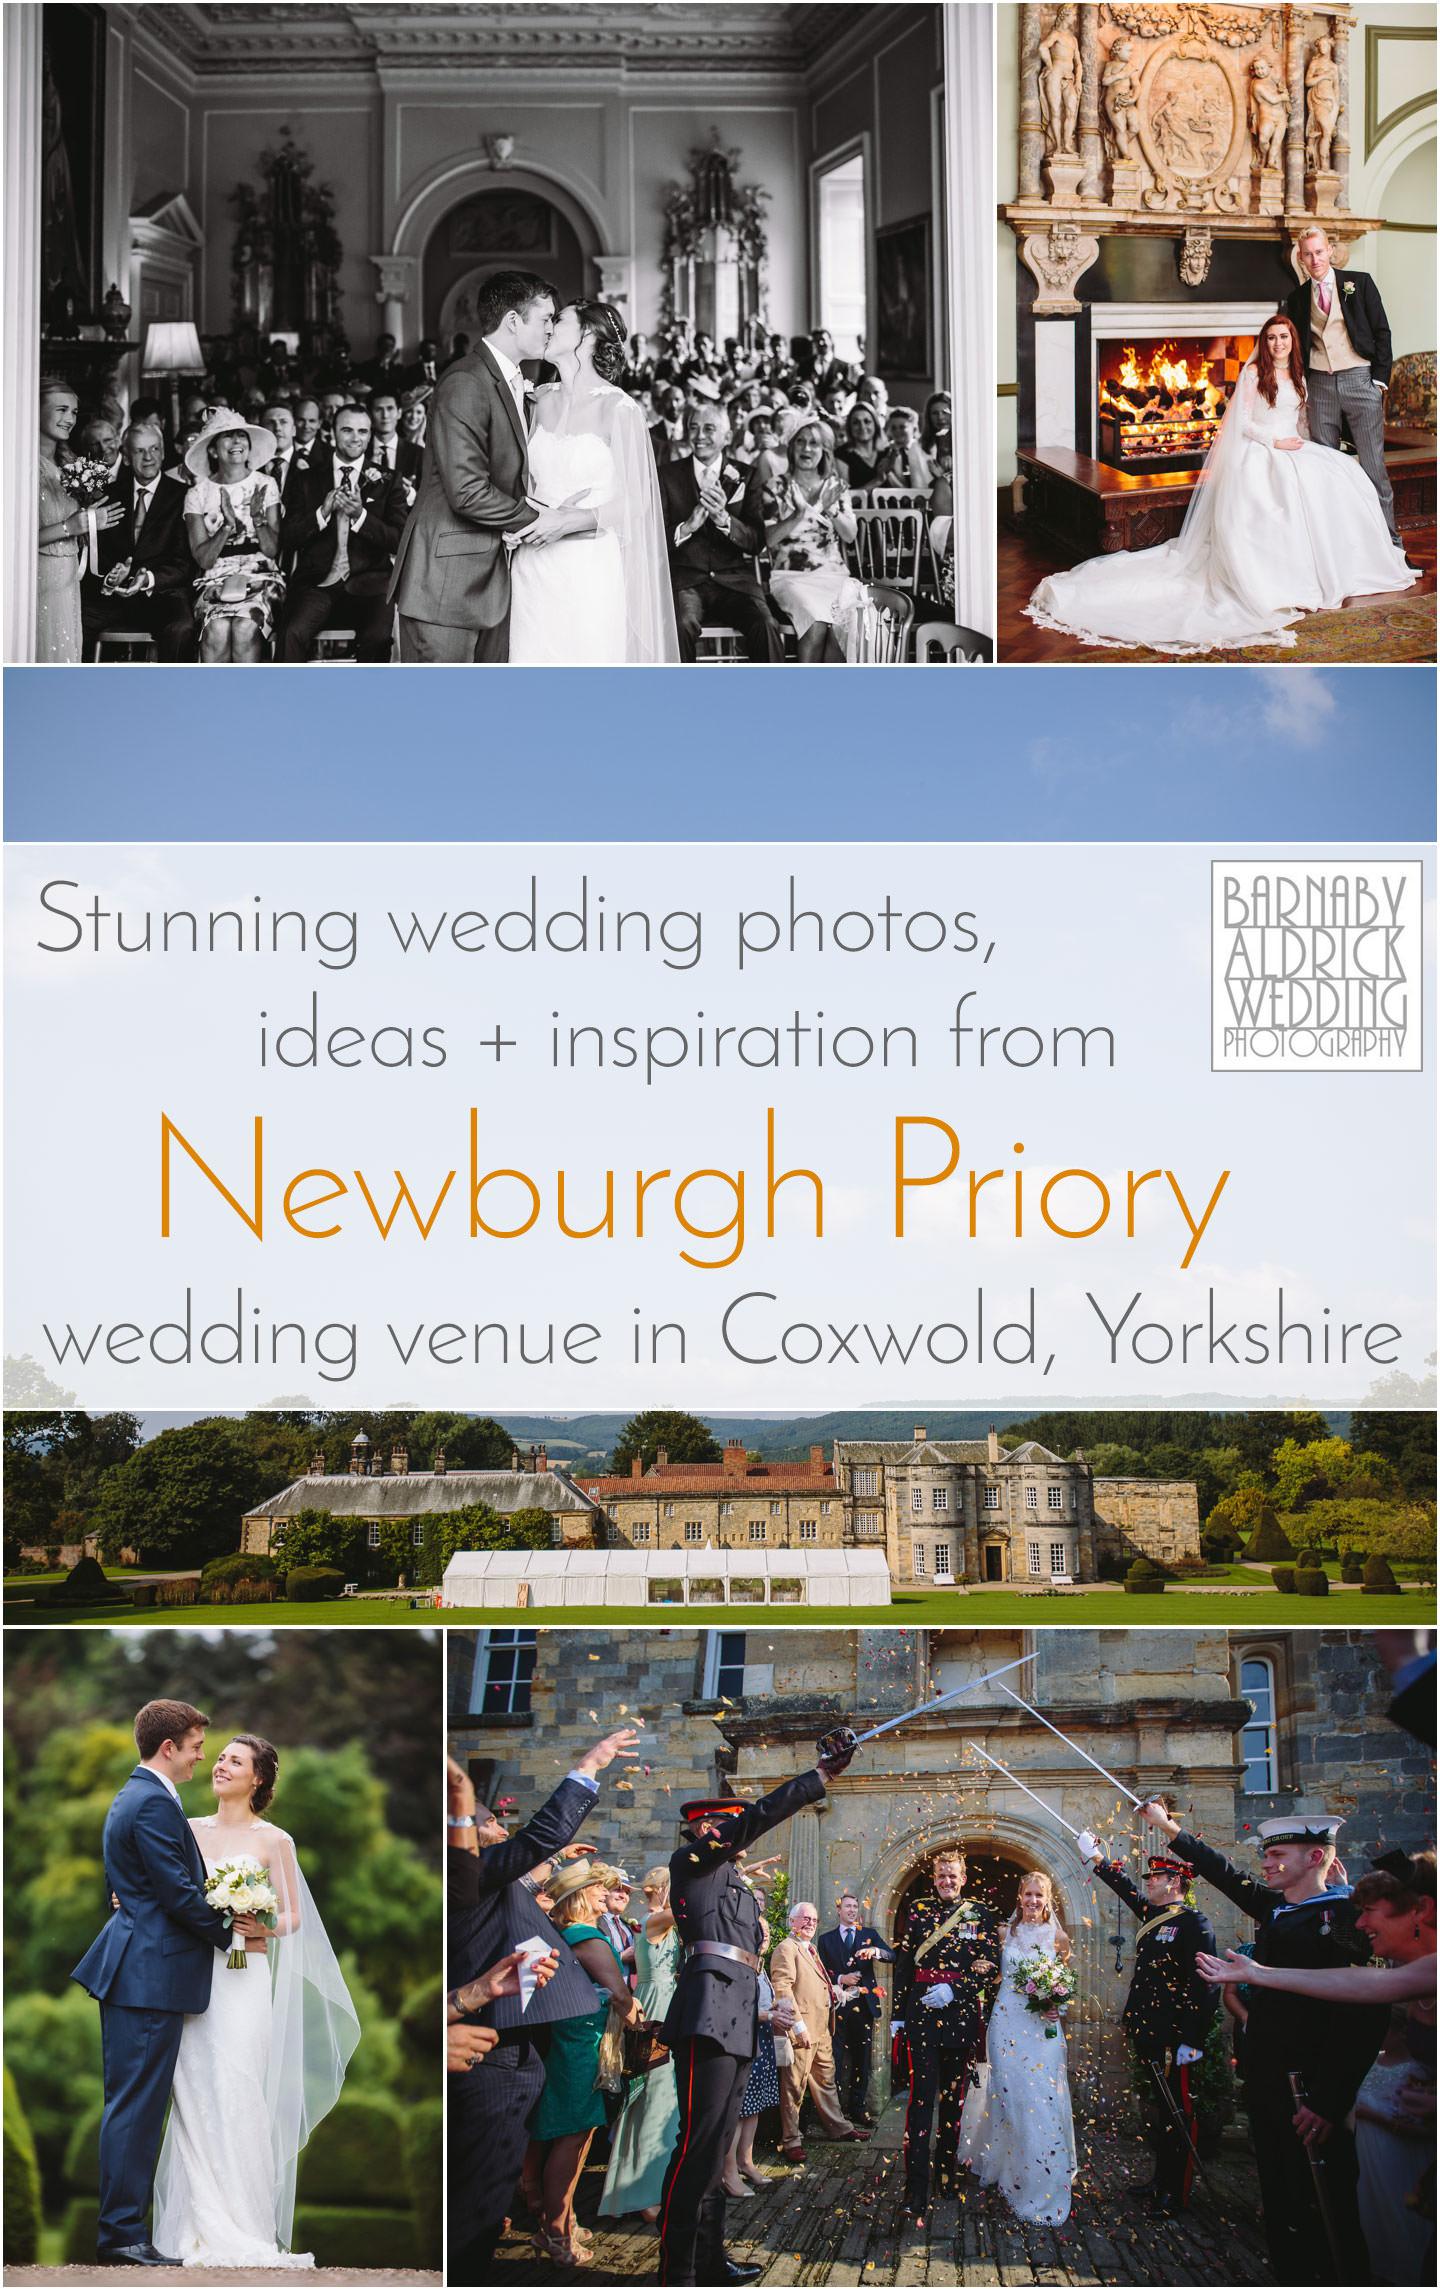 Newburgh Priory, Newburgh Priory Coxwold, Newburgh Priory Yorkshire, Newburgh Priory Wedding Photographer, Newburgh Priory Wedding Photos, Yorkshire Wedding Venues, Best Yorkshire Wedding Venues,